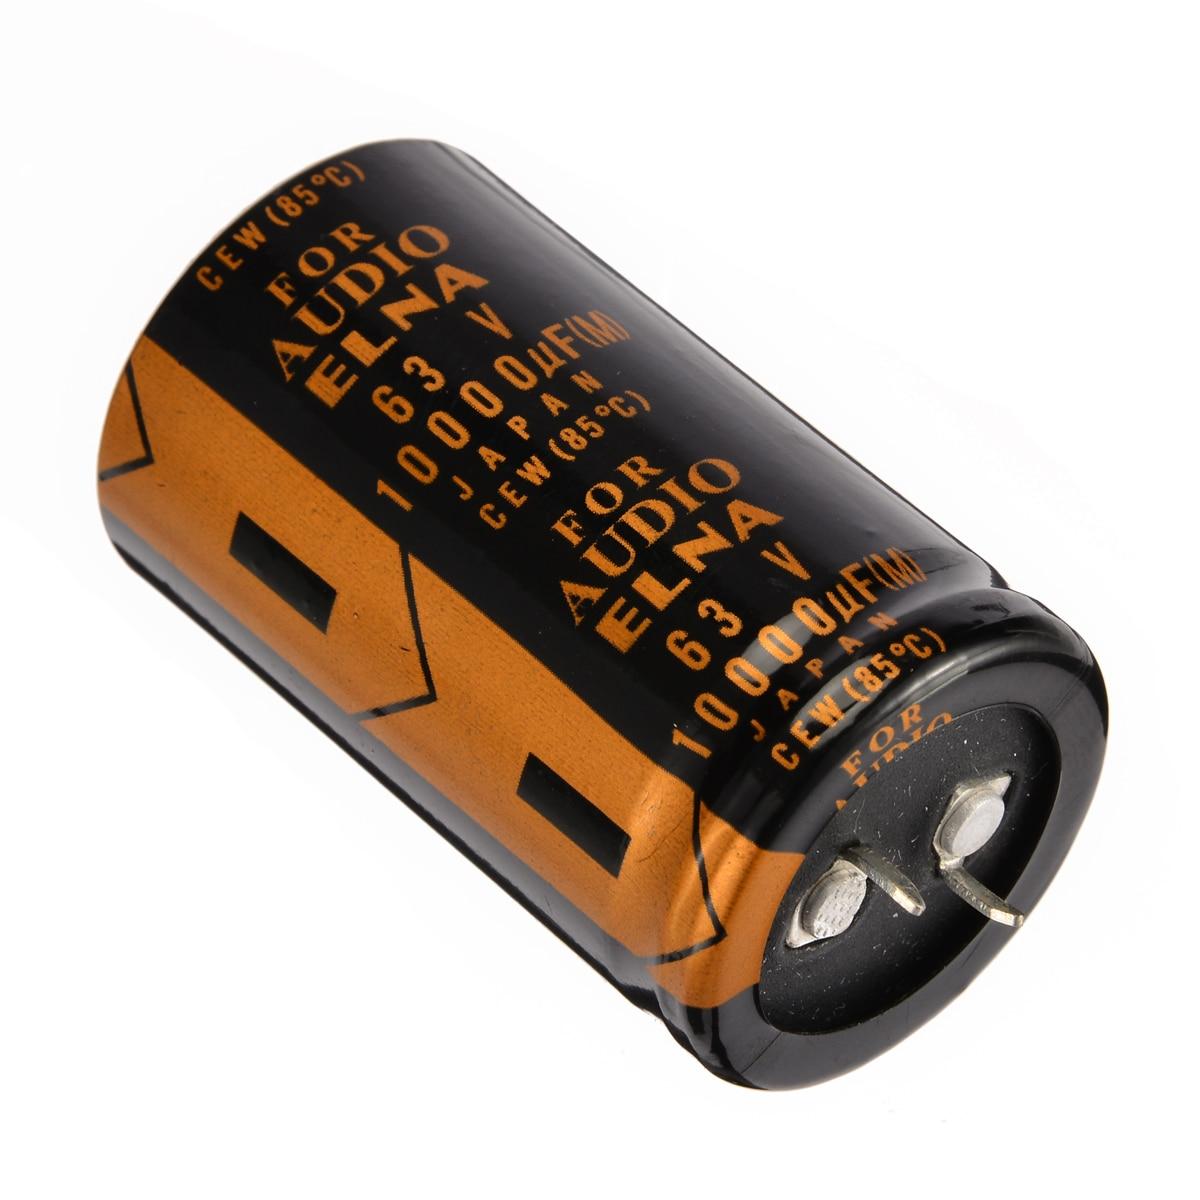 electrolytic capacitor Mayitr 4pcs 30*50mm Replacement Electrolytic Capacitor For ELNA AUDIO 63V 10000UF (2)